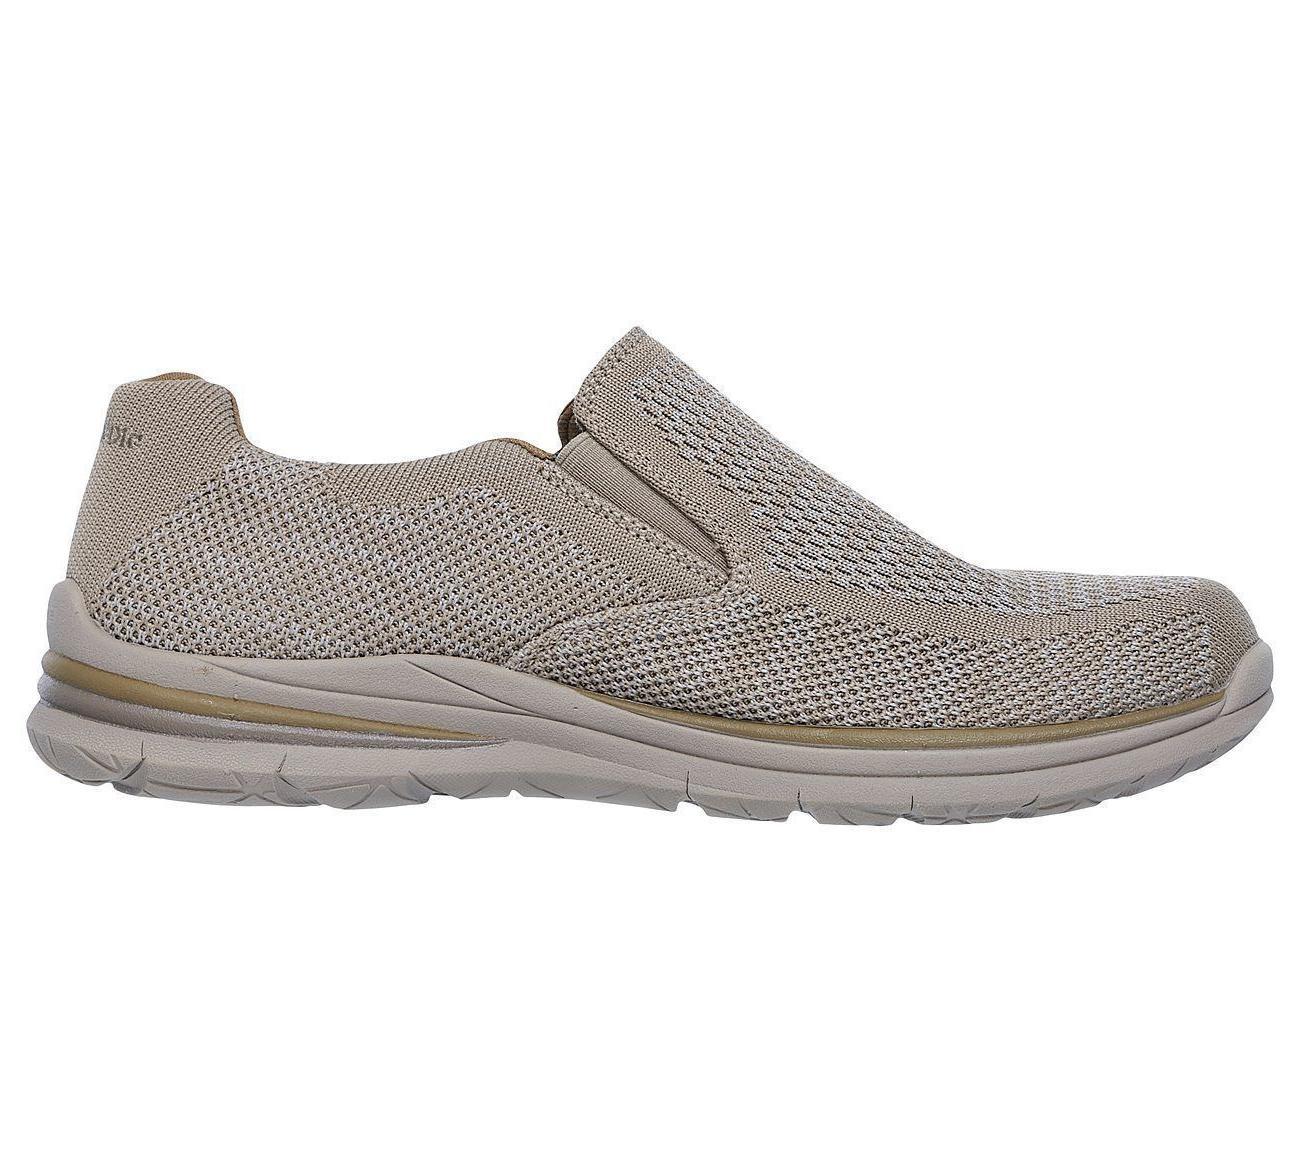 Denim Taupe Shoes Men Casual Loafer Slip On